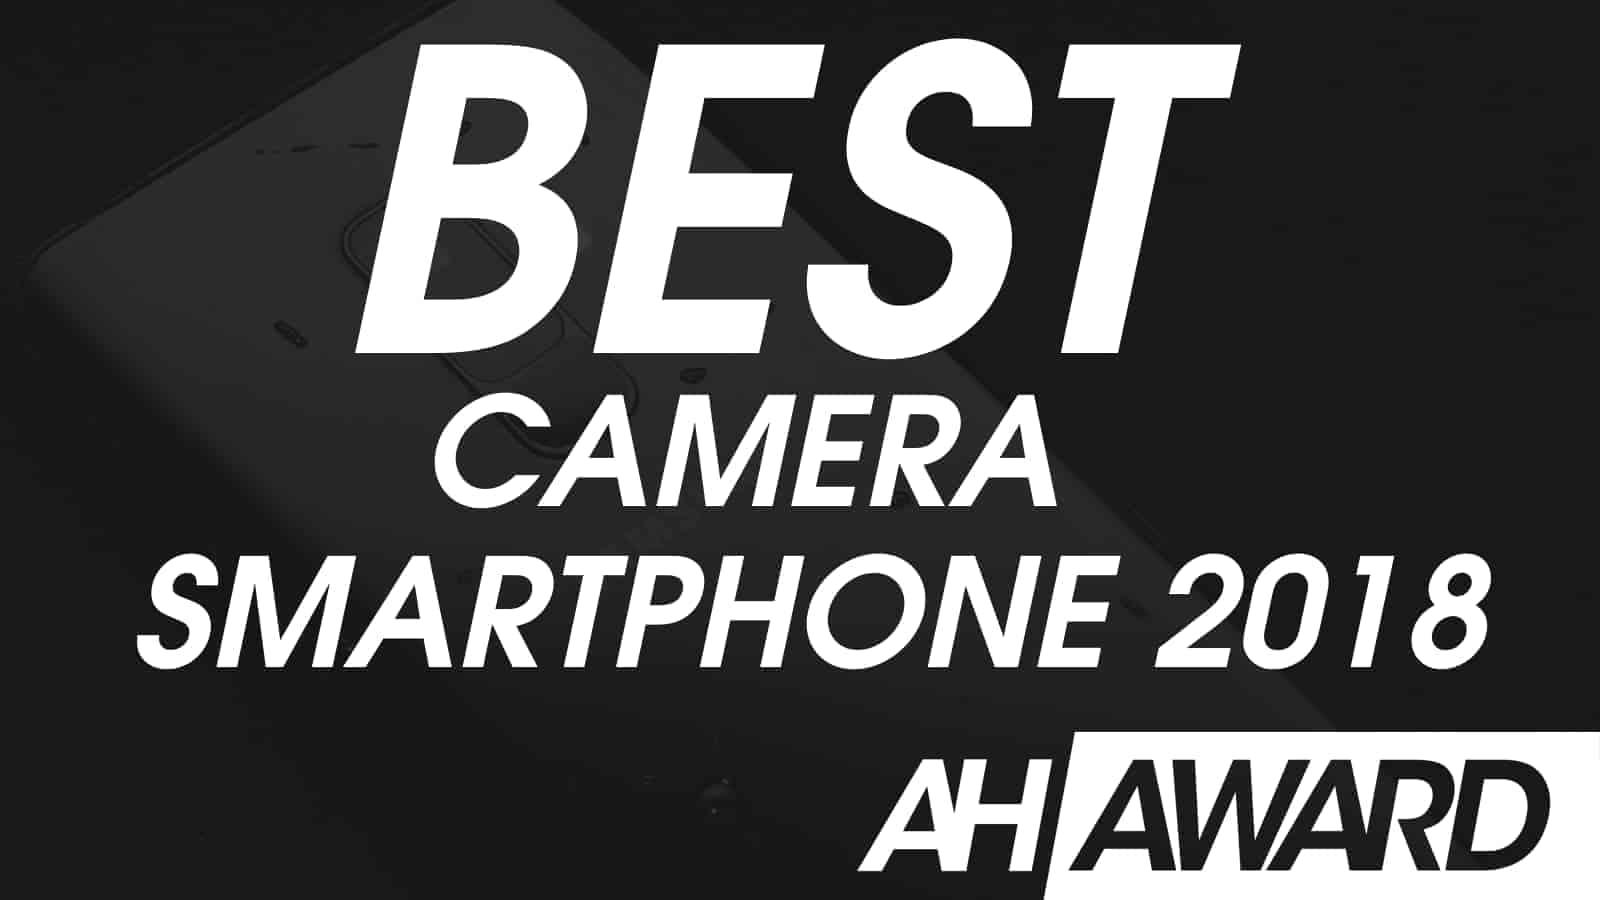 ANDROID HEADLINES AWARDS BEST CAMERA SMARTPHONE 2018